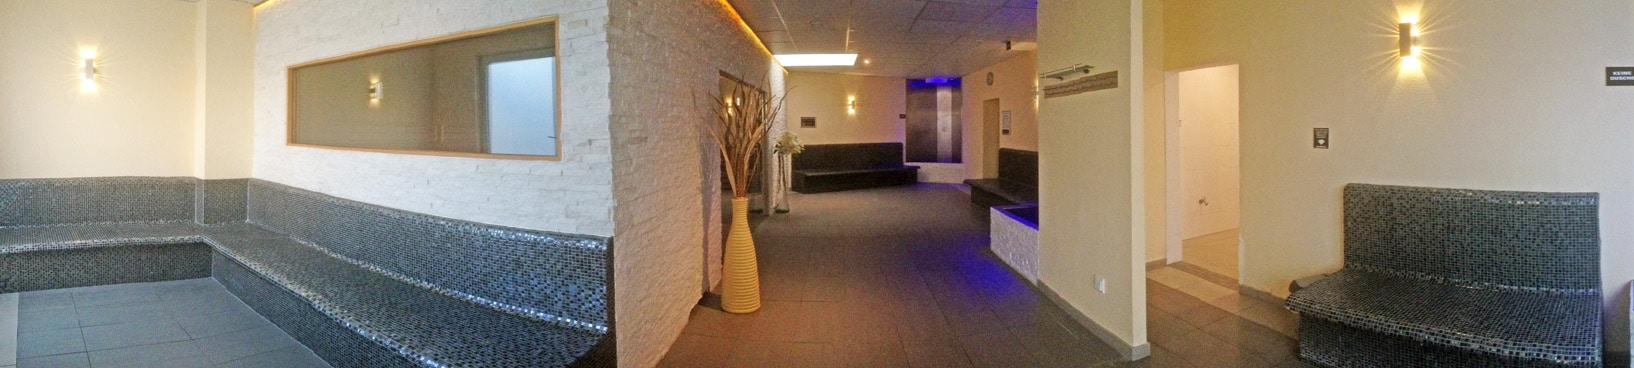 Fitnesspark Limburg Sauna 2